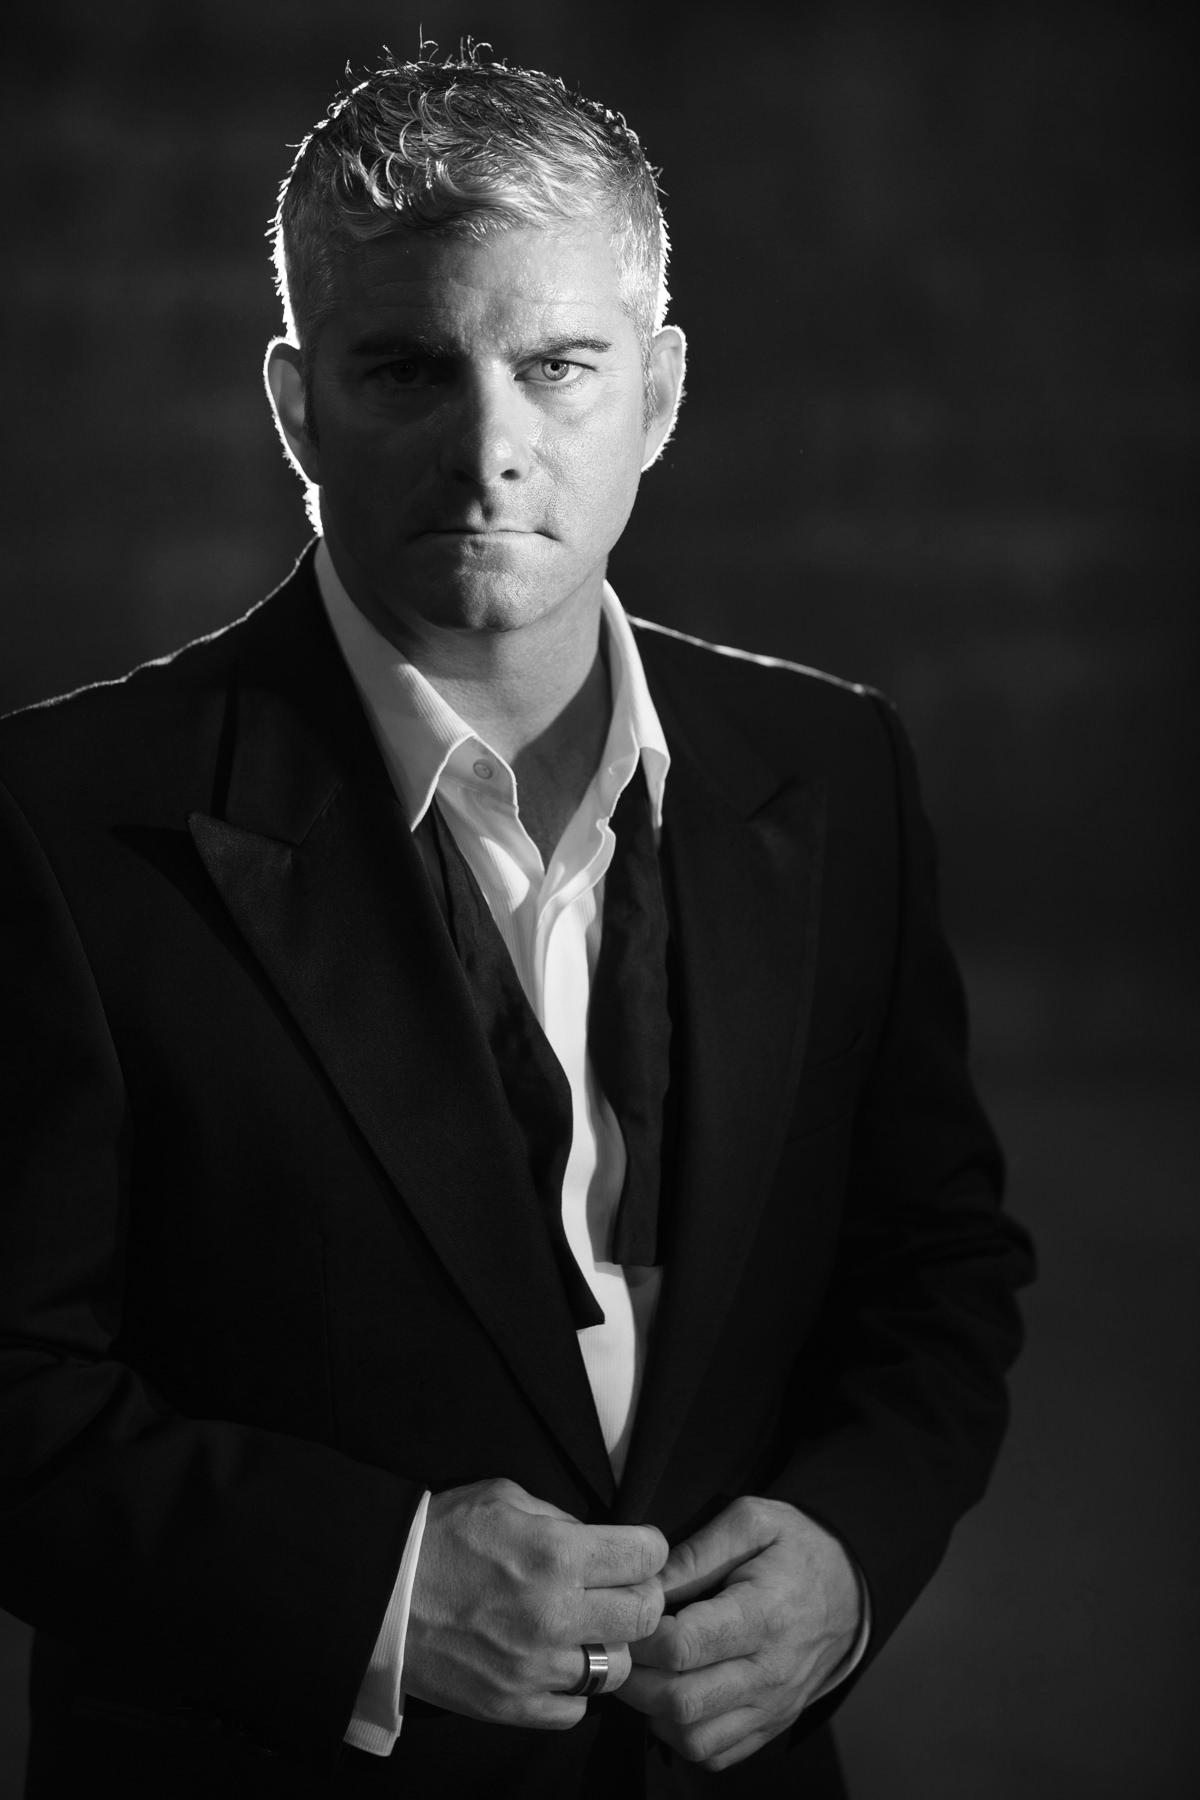 charleston portrait photographer_25